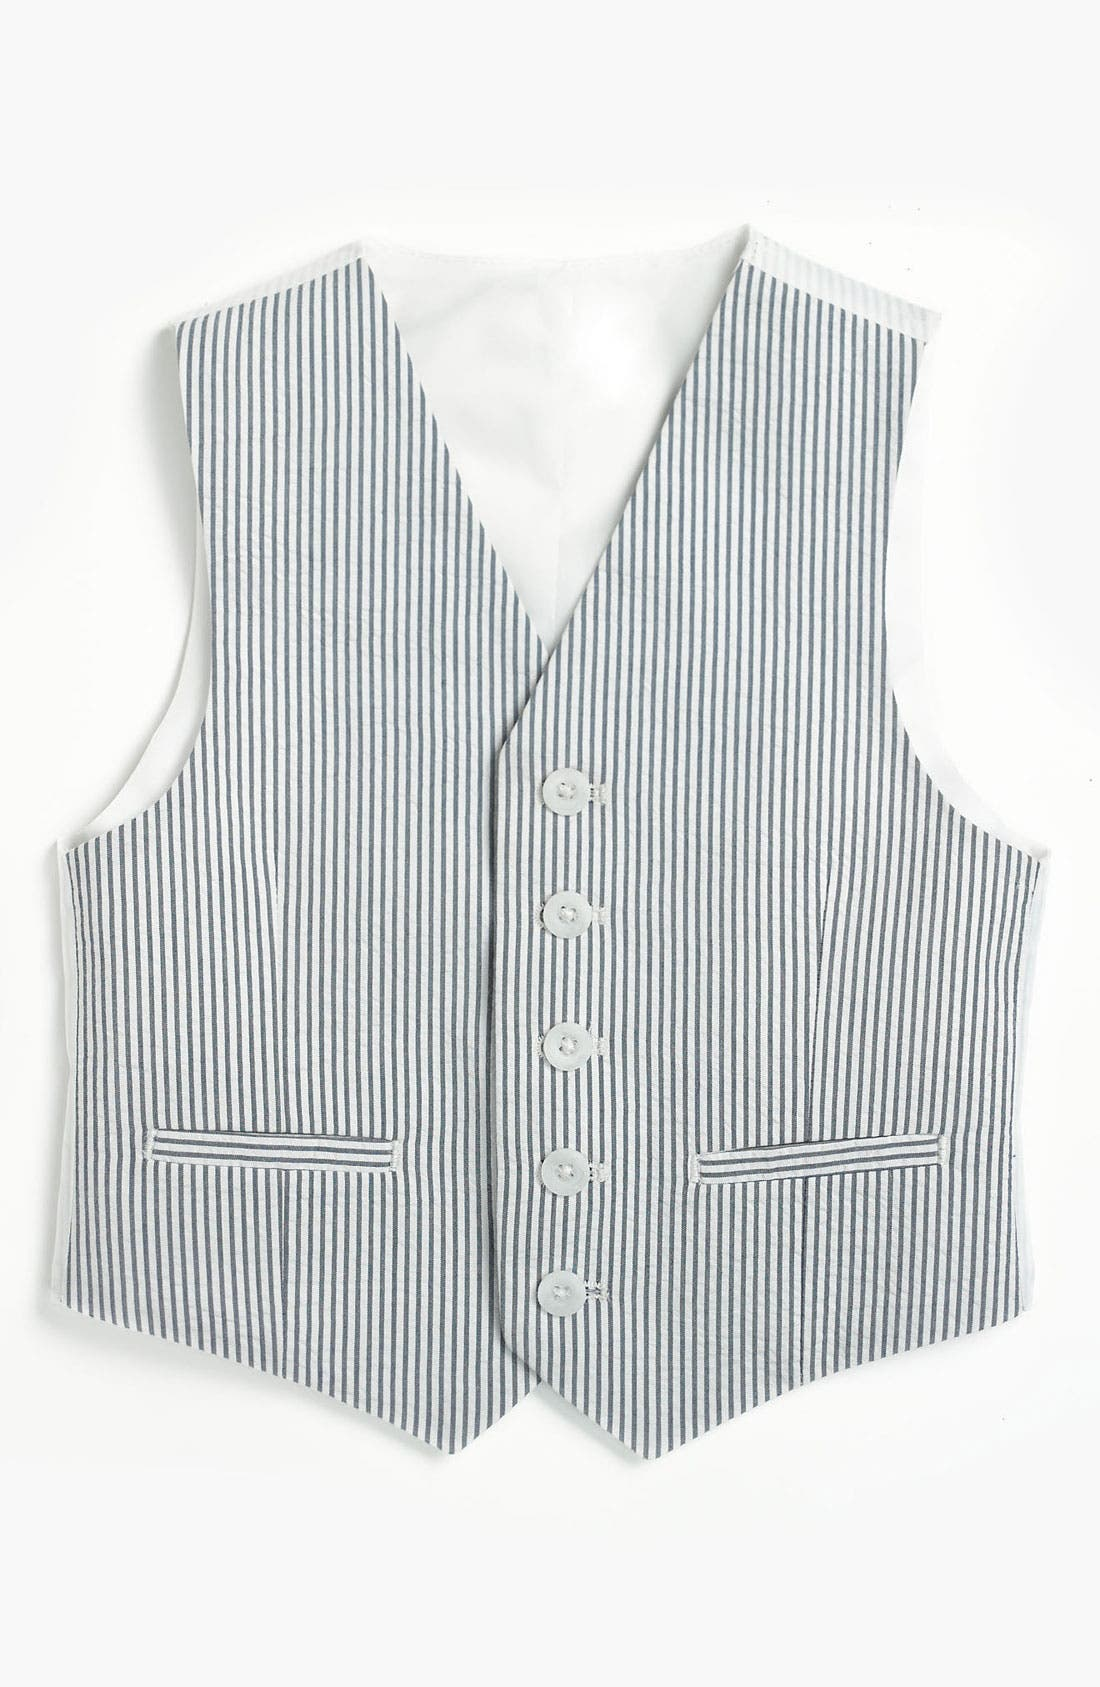 Alternate Image 1 Selected - Nordstrom 'Andrew' Vest (Little Boys & Big Boys)